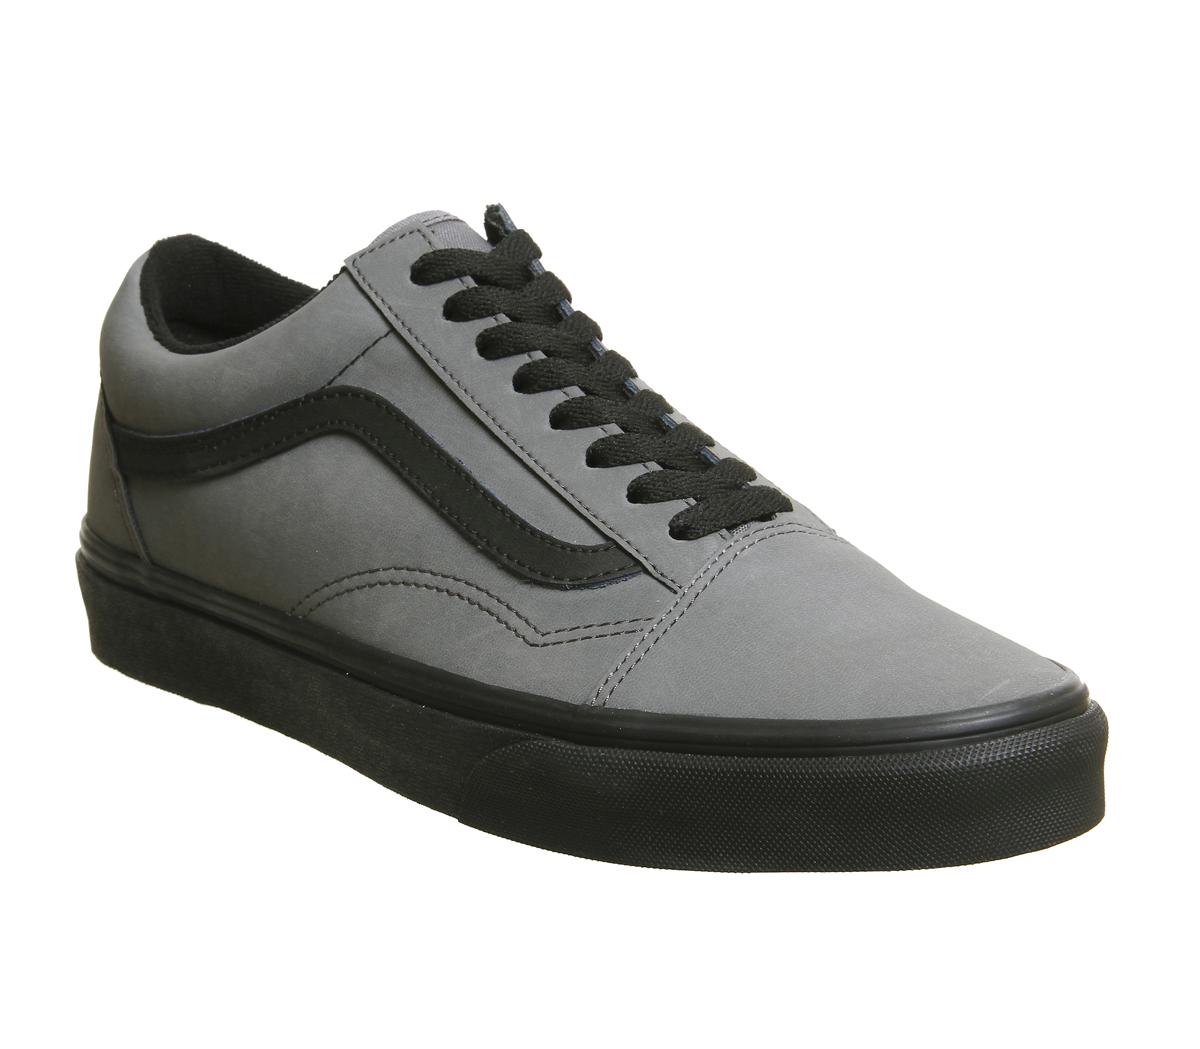 Negro Old Zapatillas Buck Estaño Skool Mujer Vans qT5AxwXnTO